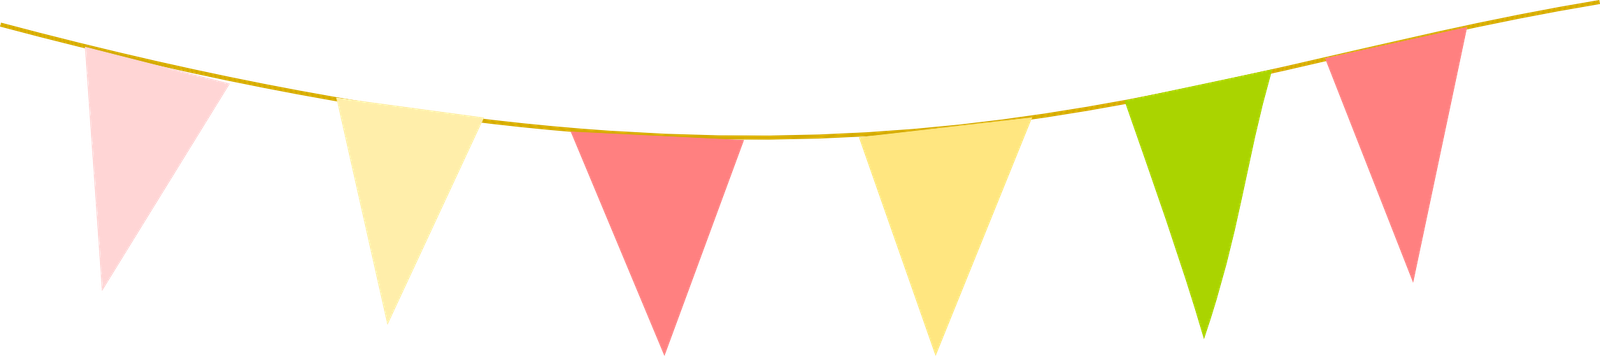 Banner Flag Clipart Transparent.